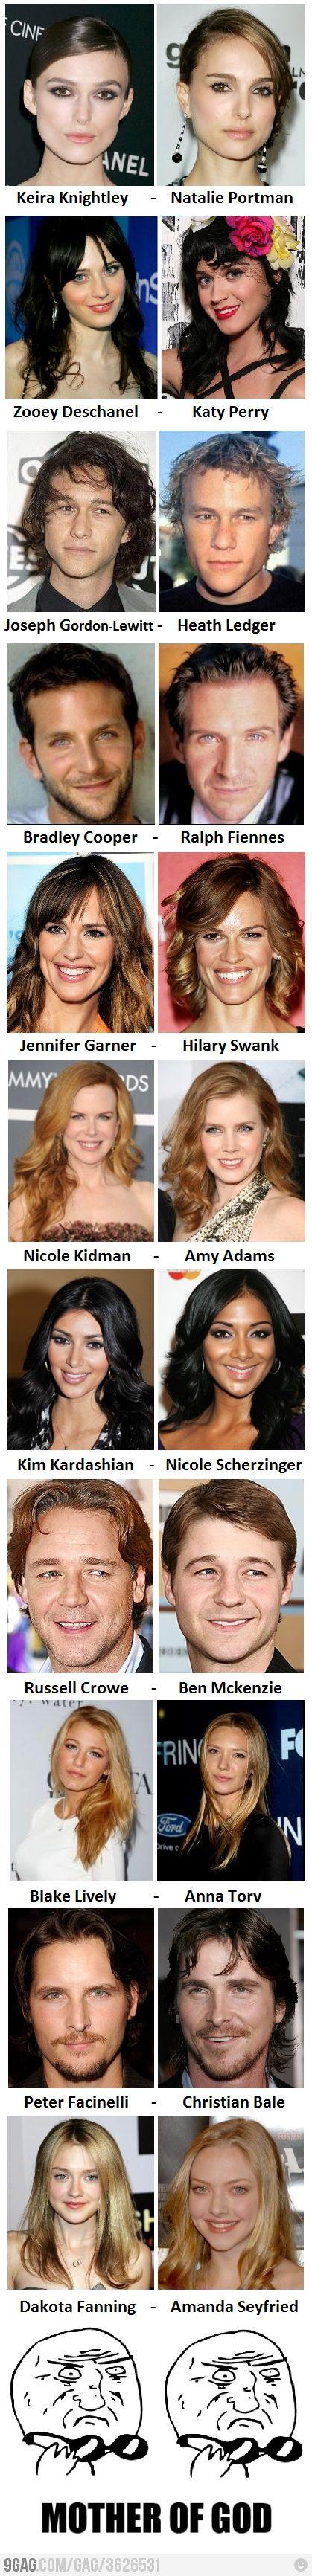 Celebrity doppelgängers. This is crazy!